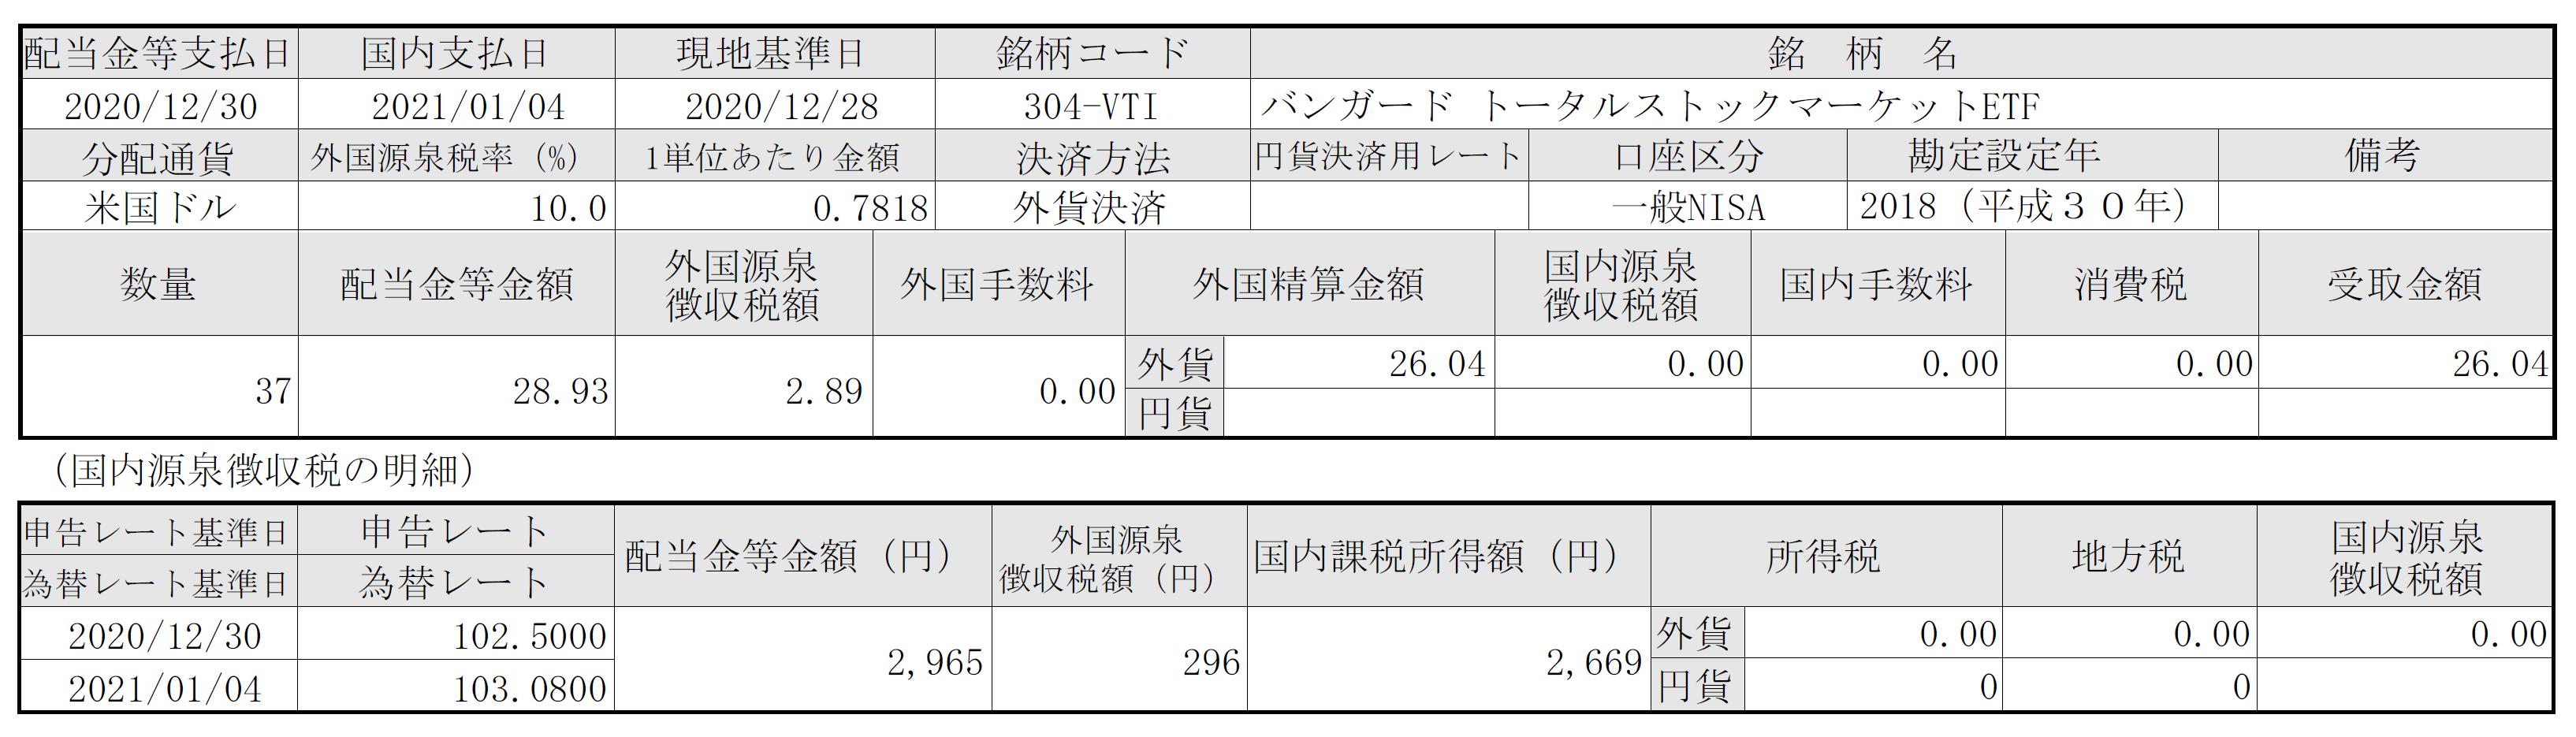 f:id:hodo-work:20210112110947p:plain